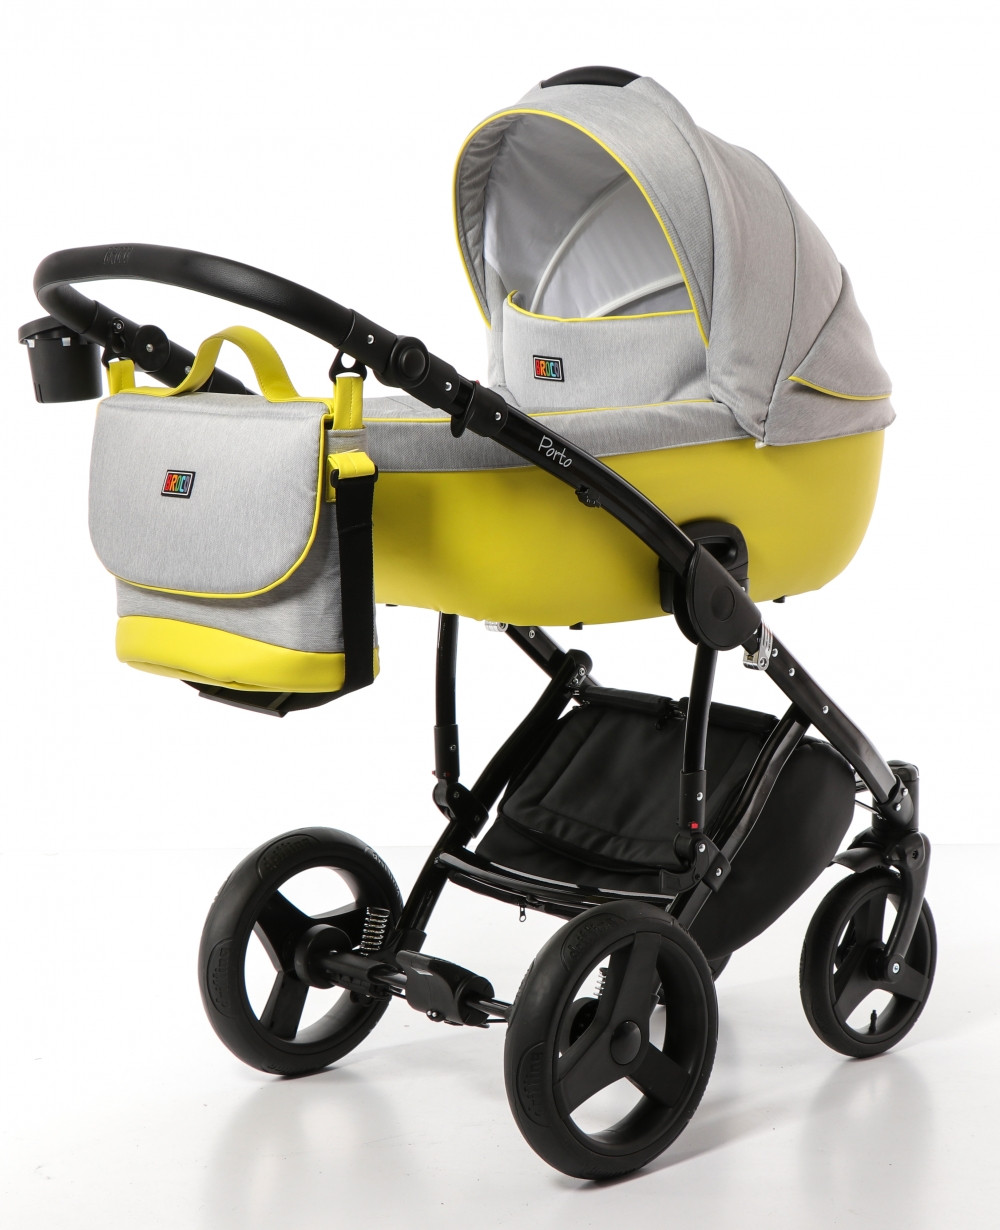 Коляска Broco Porto 01 желтый/серый 2в1